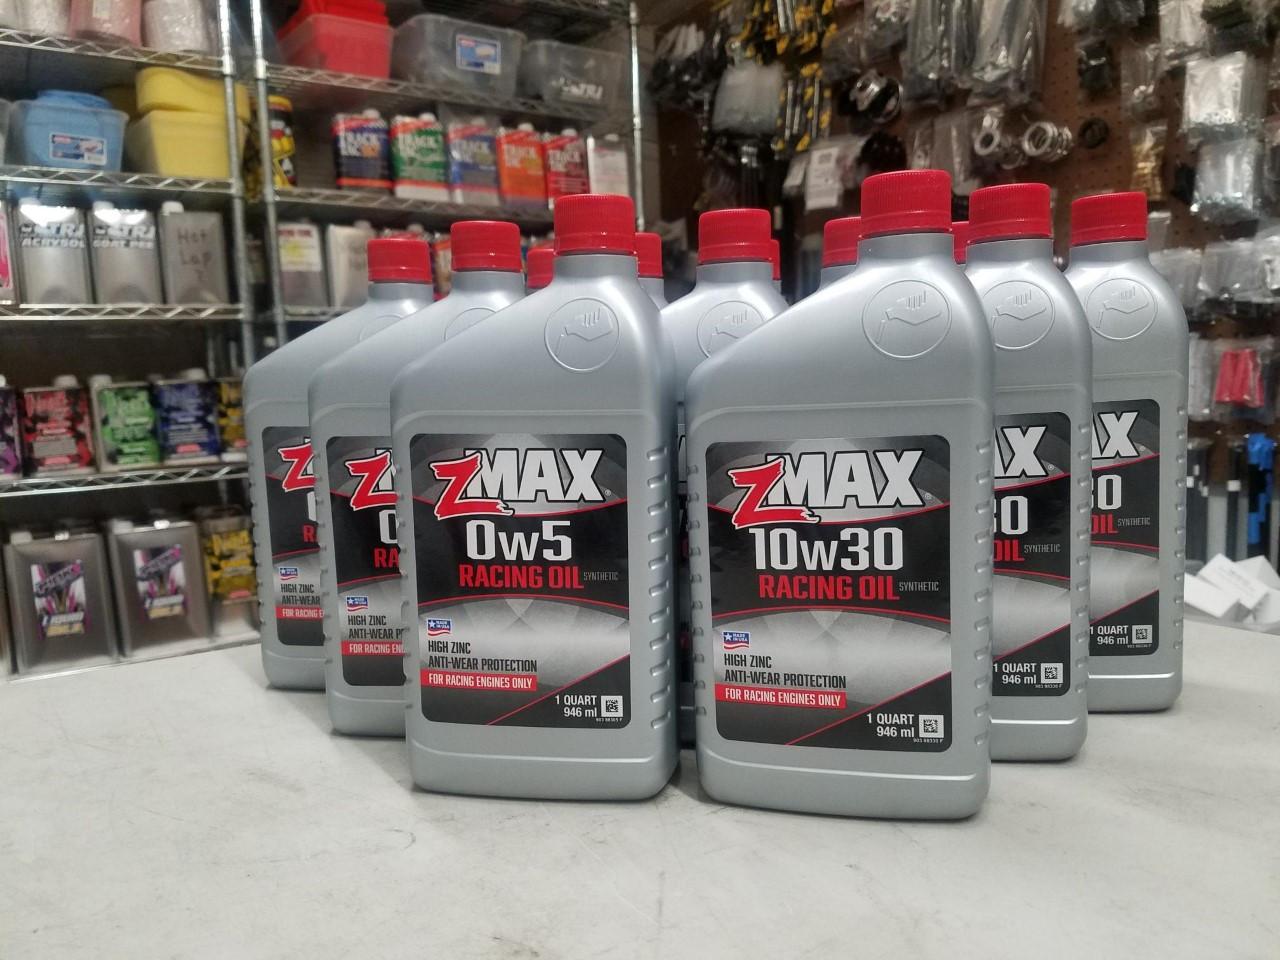 zMAX 20w50 Racing Oil - 12 qt Case